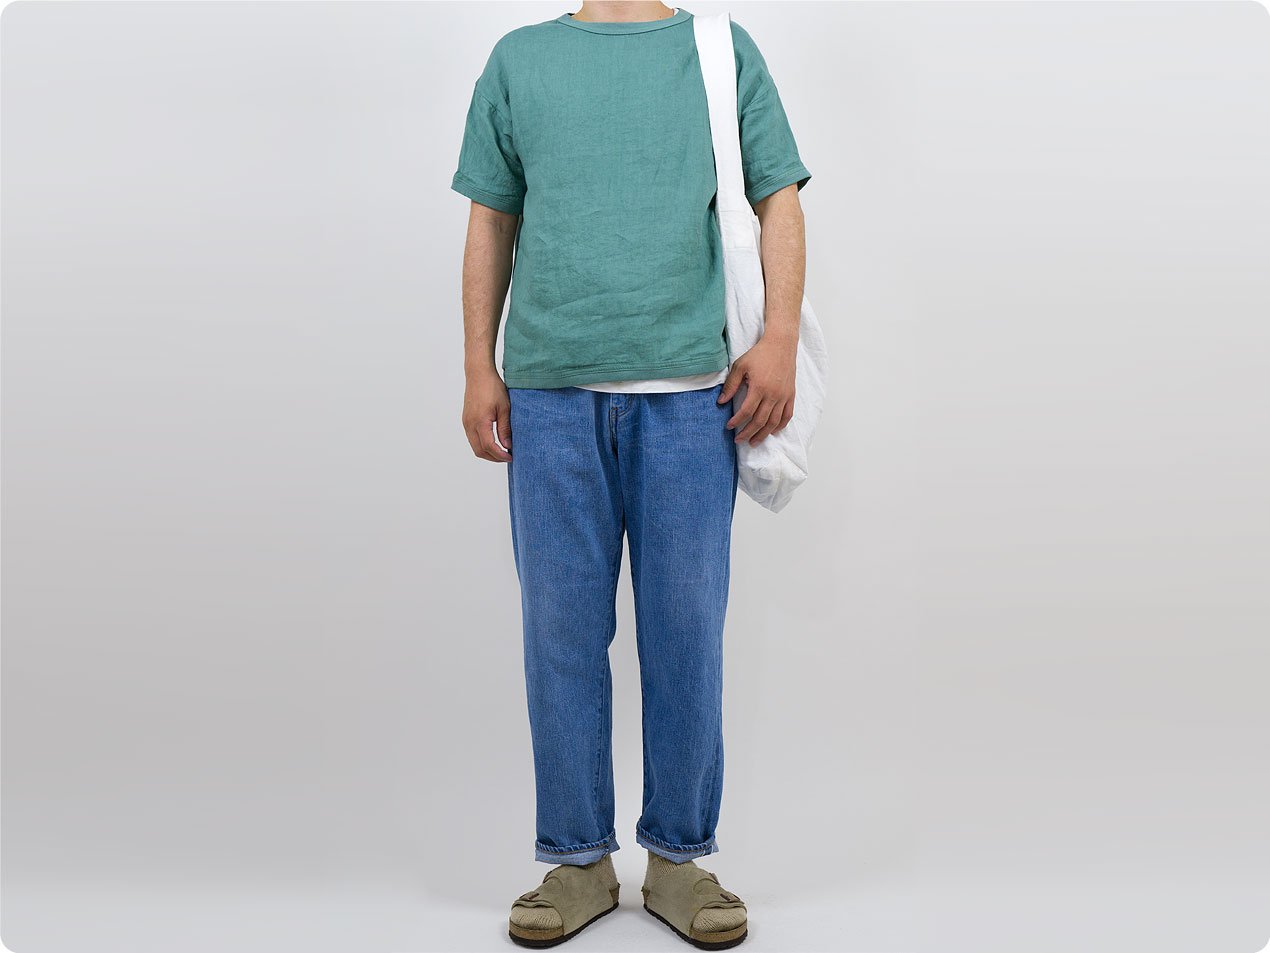 maillot linen shirts Tee SMOKE GREEN